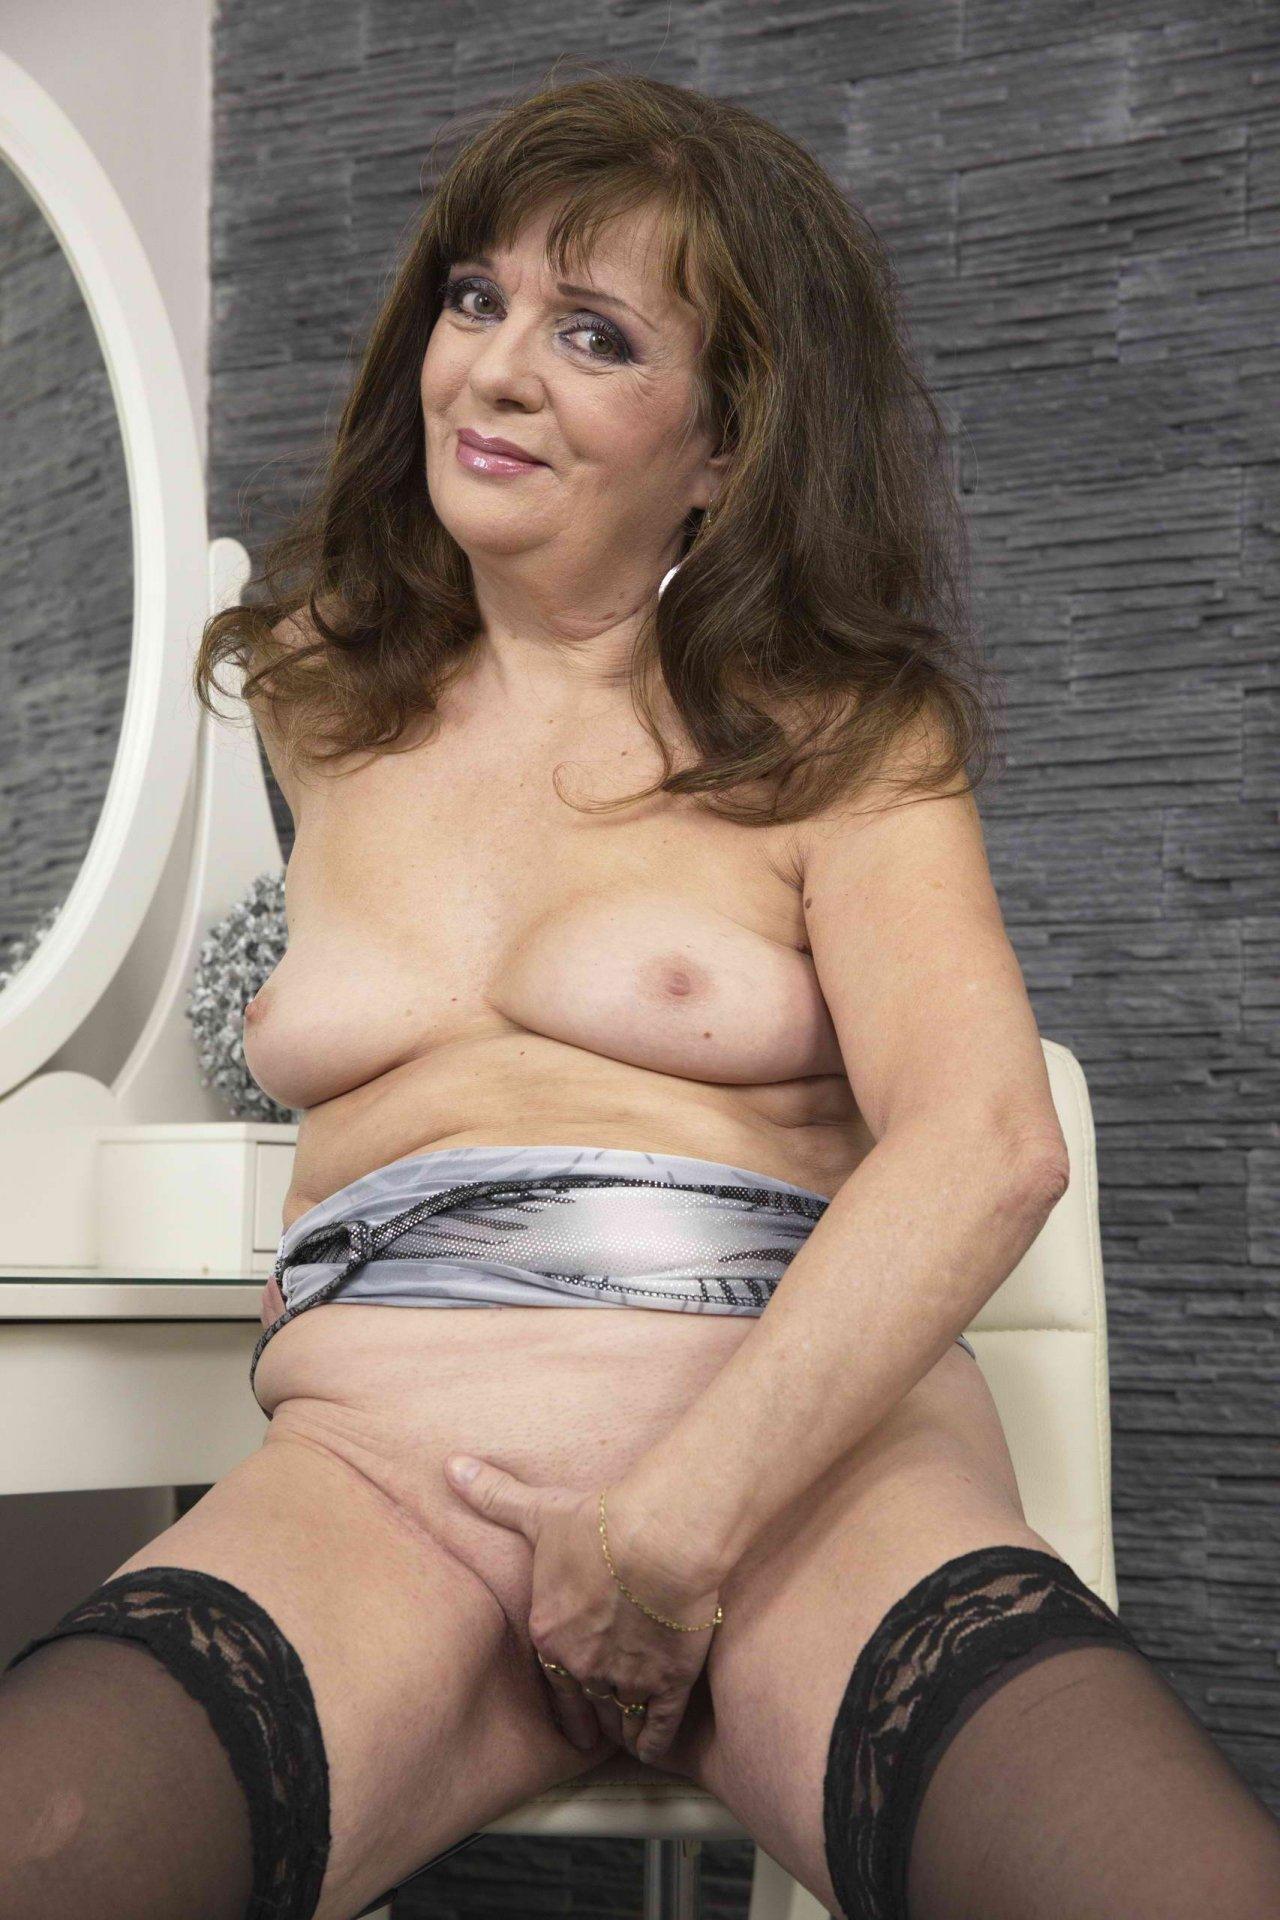 lustyAdriana from City of Nottingham,United Kingdom